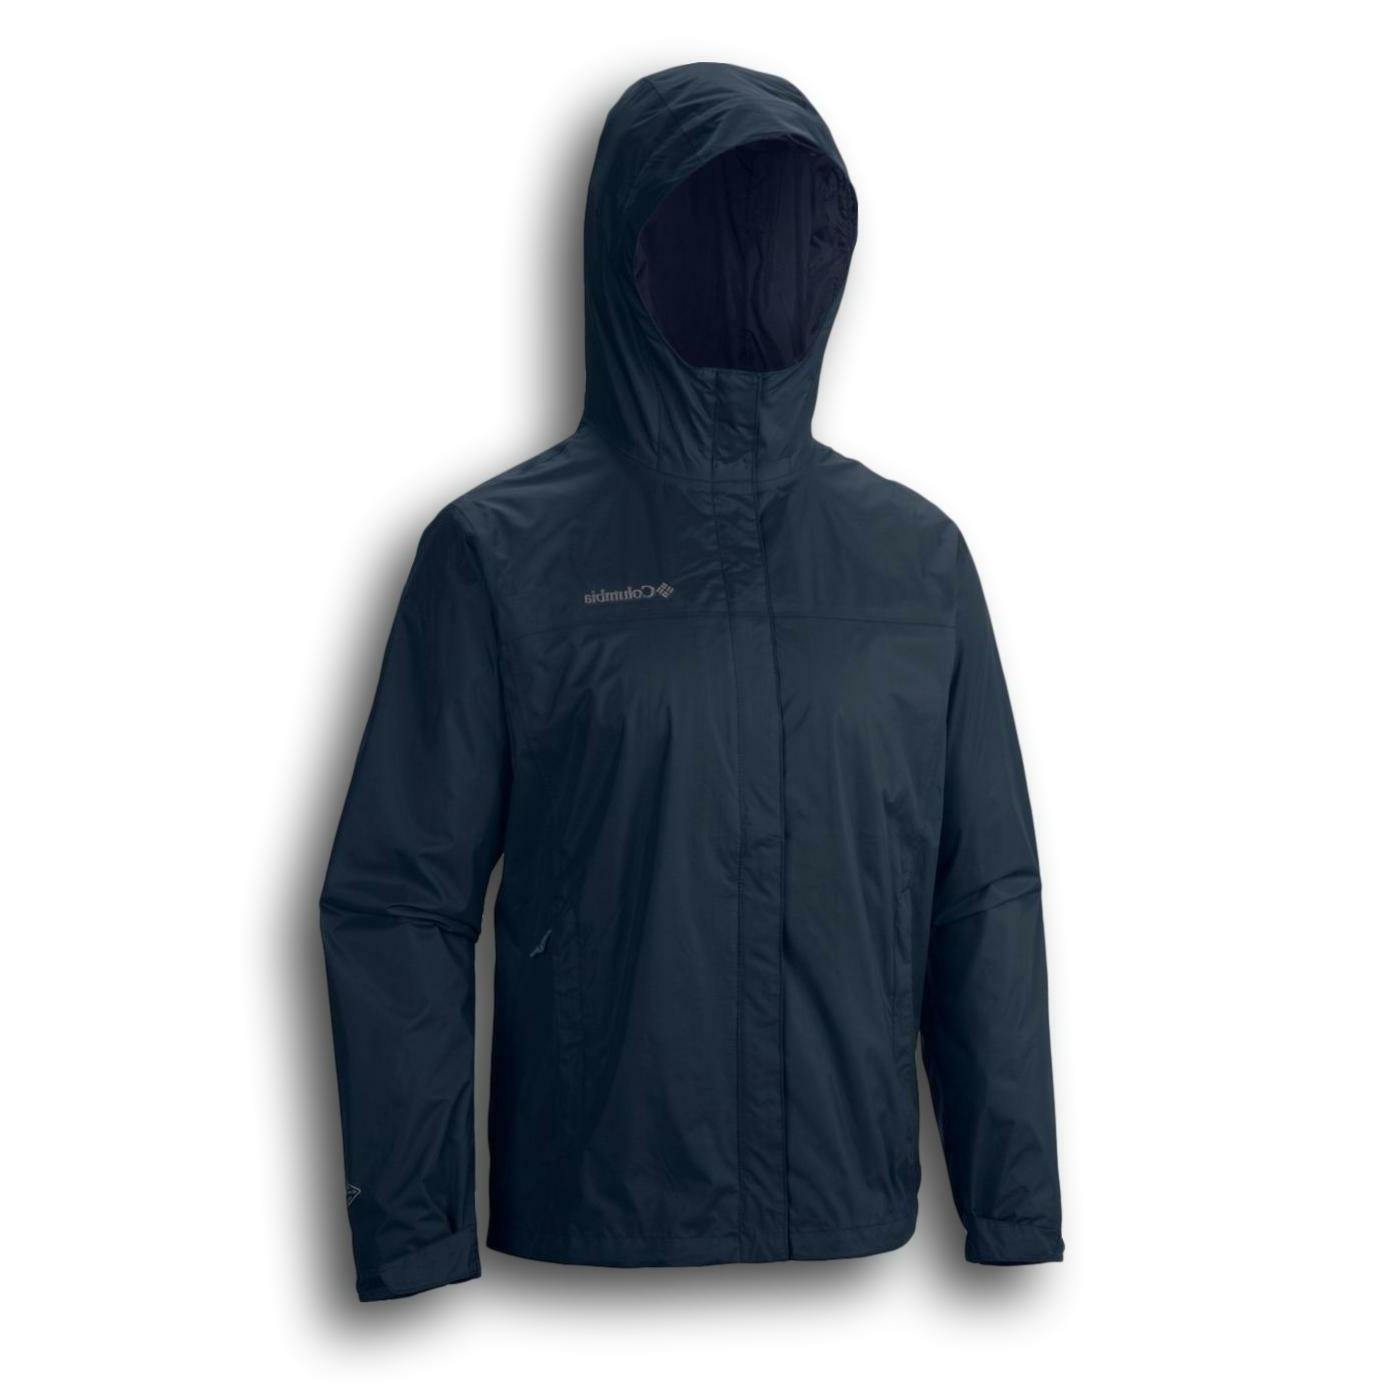 New Pointe waterproof jacket coat Tall